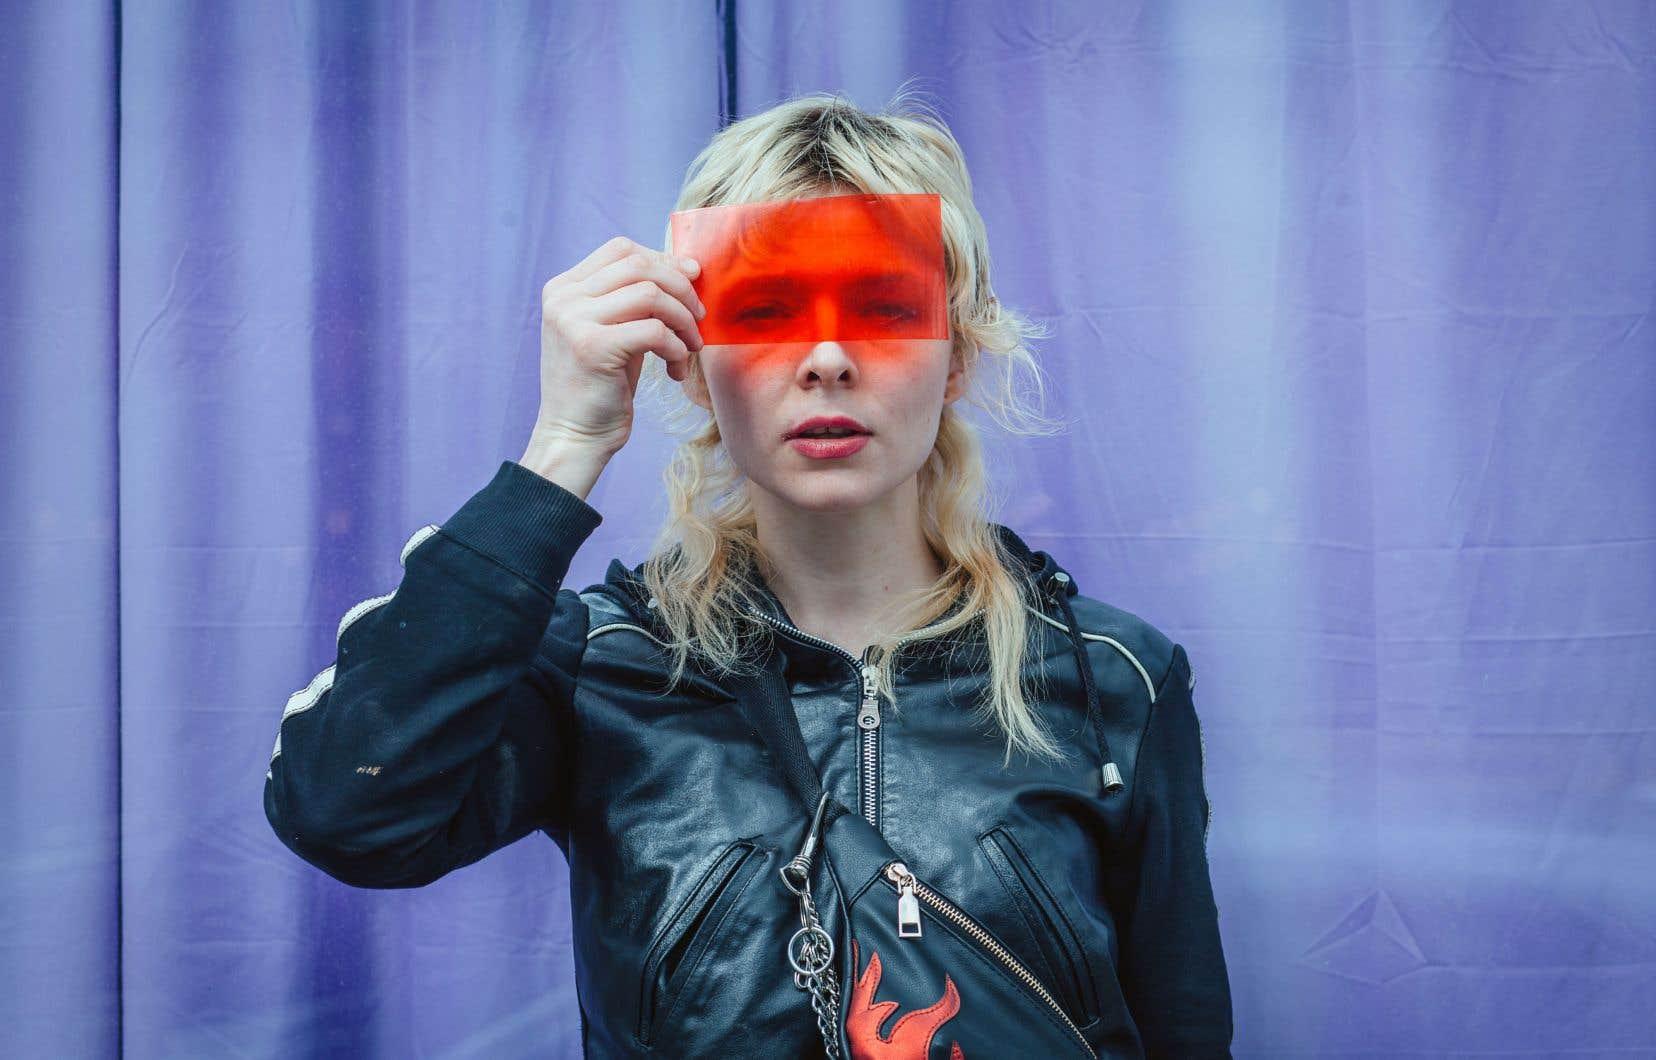 L'art-pop à l'esprit punk d'Alexandra Mackenzie, alias Petra Glynt, est dansant et affranchi.